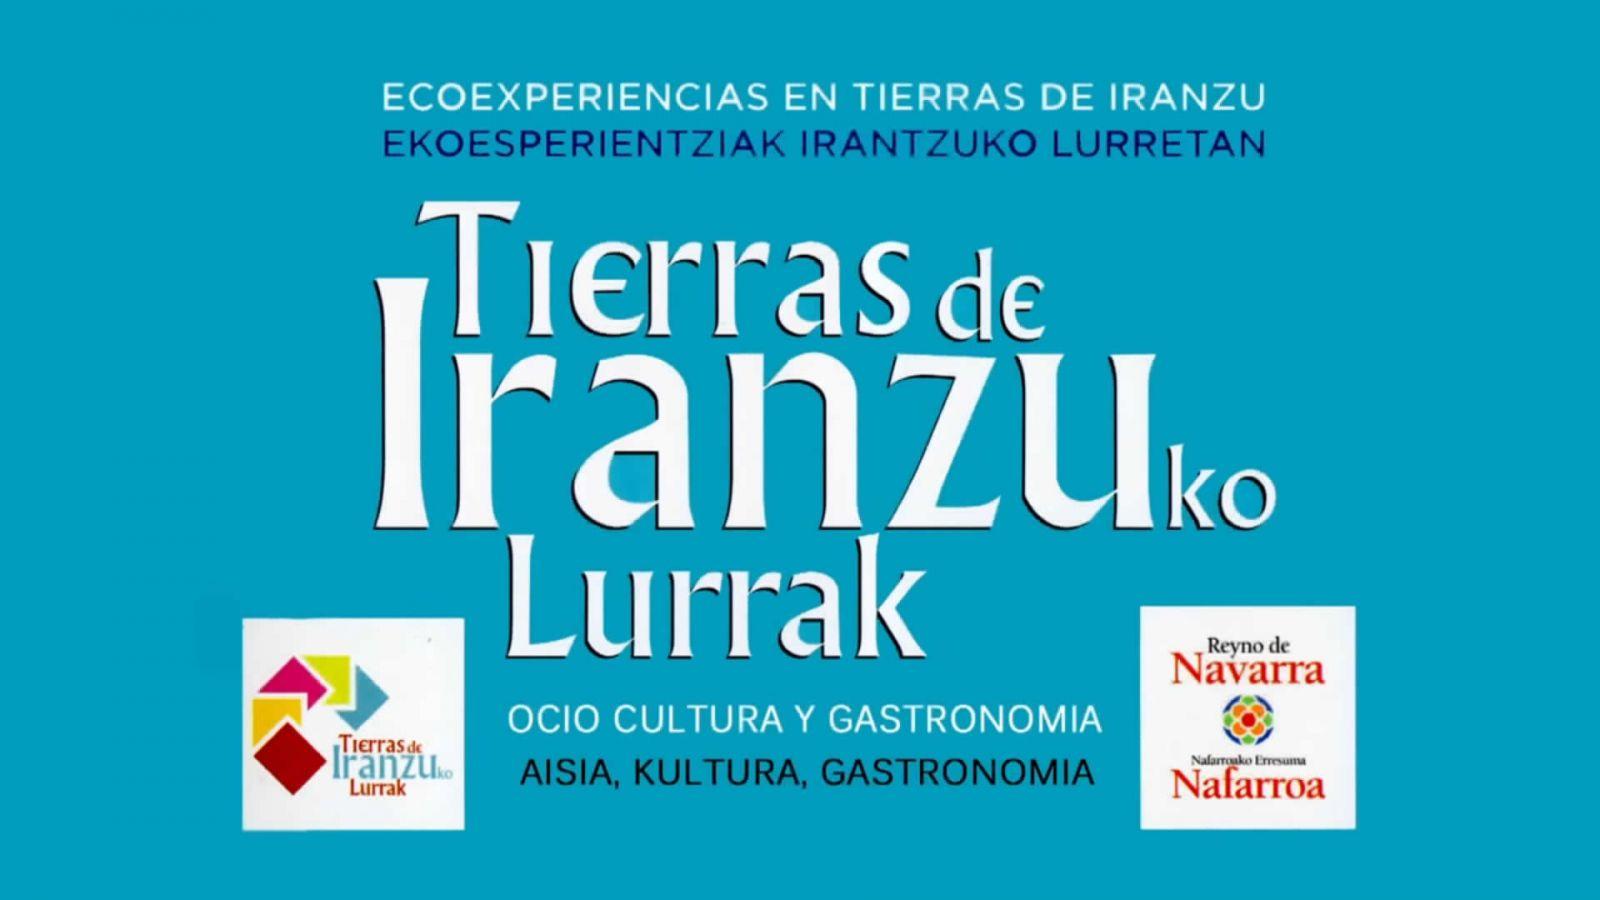 Video Tierras Iranzu Turismo Rural Navarra